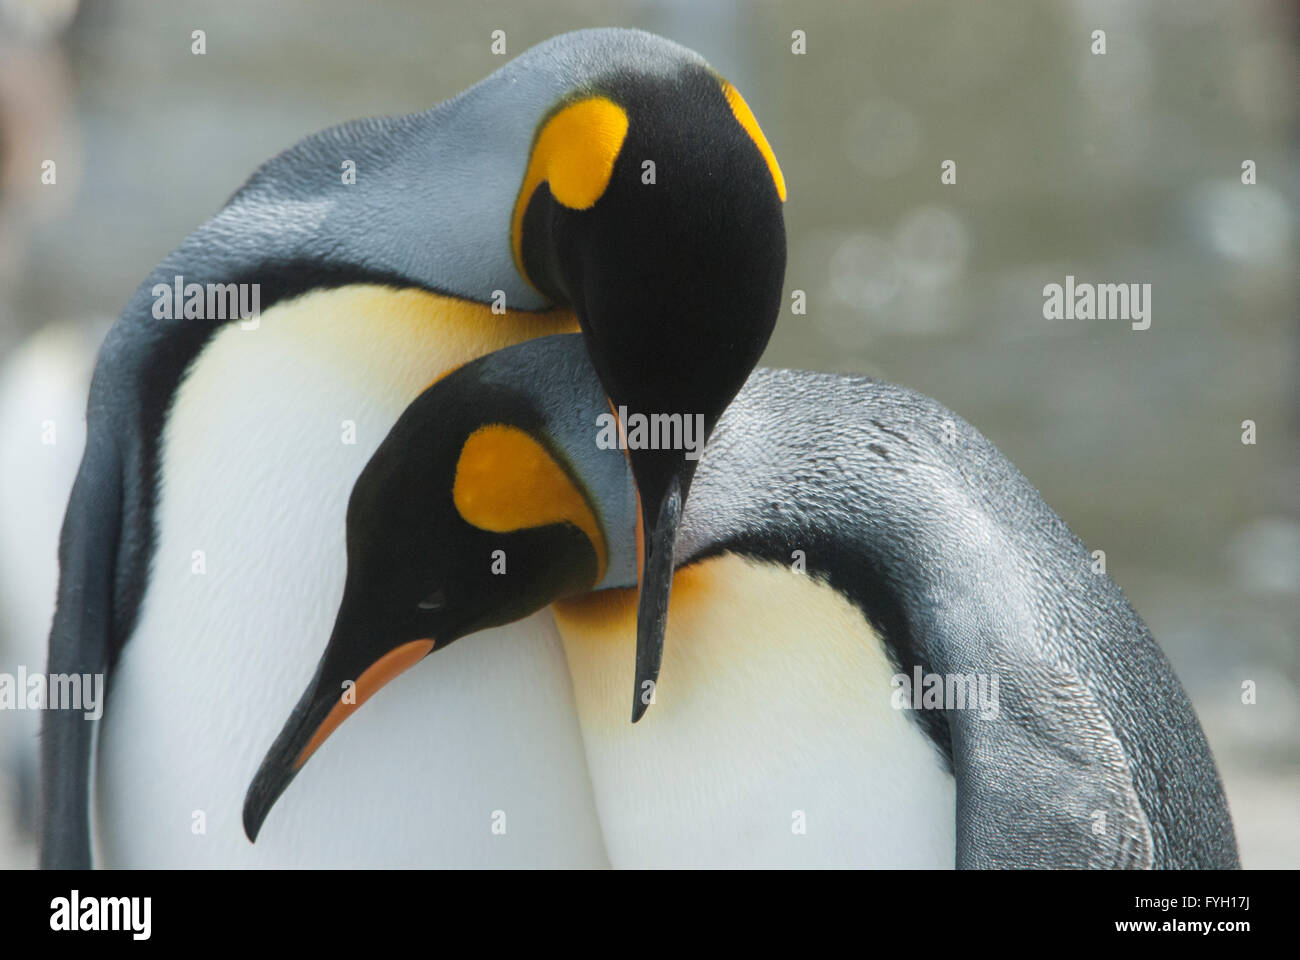 King penguin in South Georgia - Stock Image